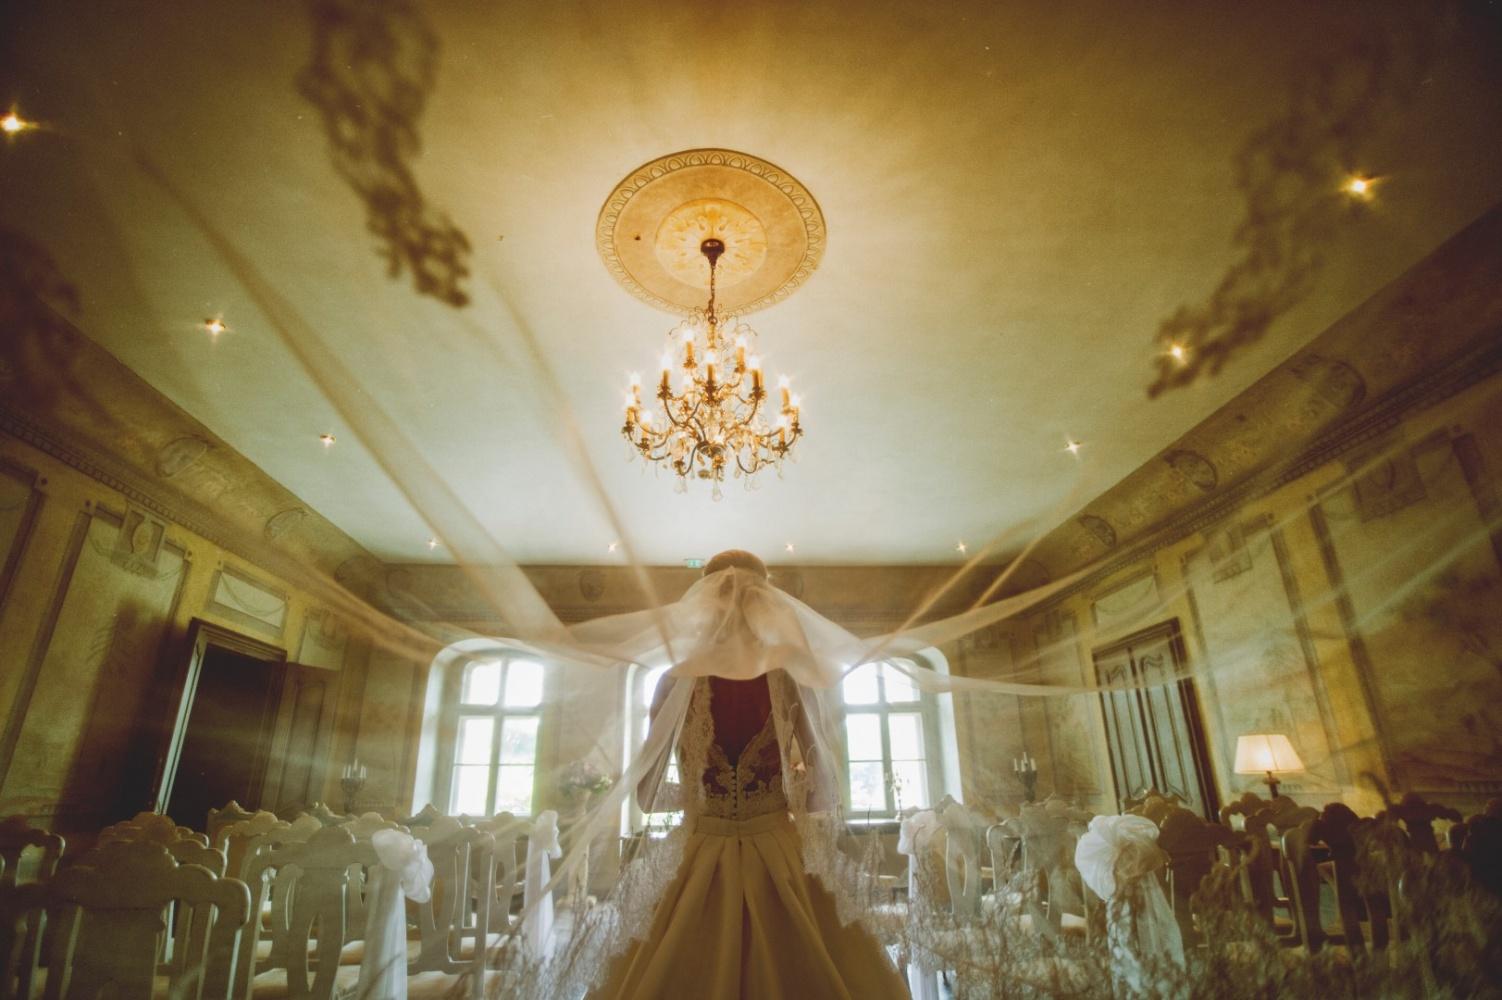 http://www.fotoz.sk/images/gallery-26/normal/svadba_hotel-chateau-bela_003.jpg